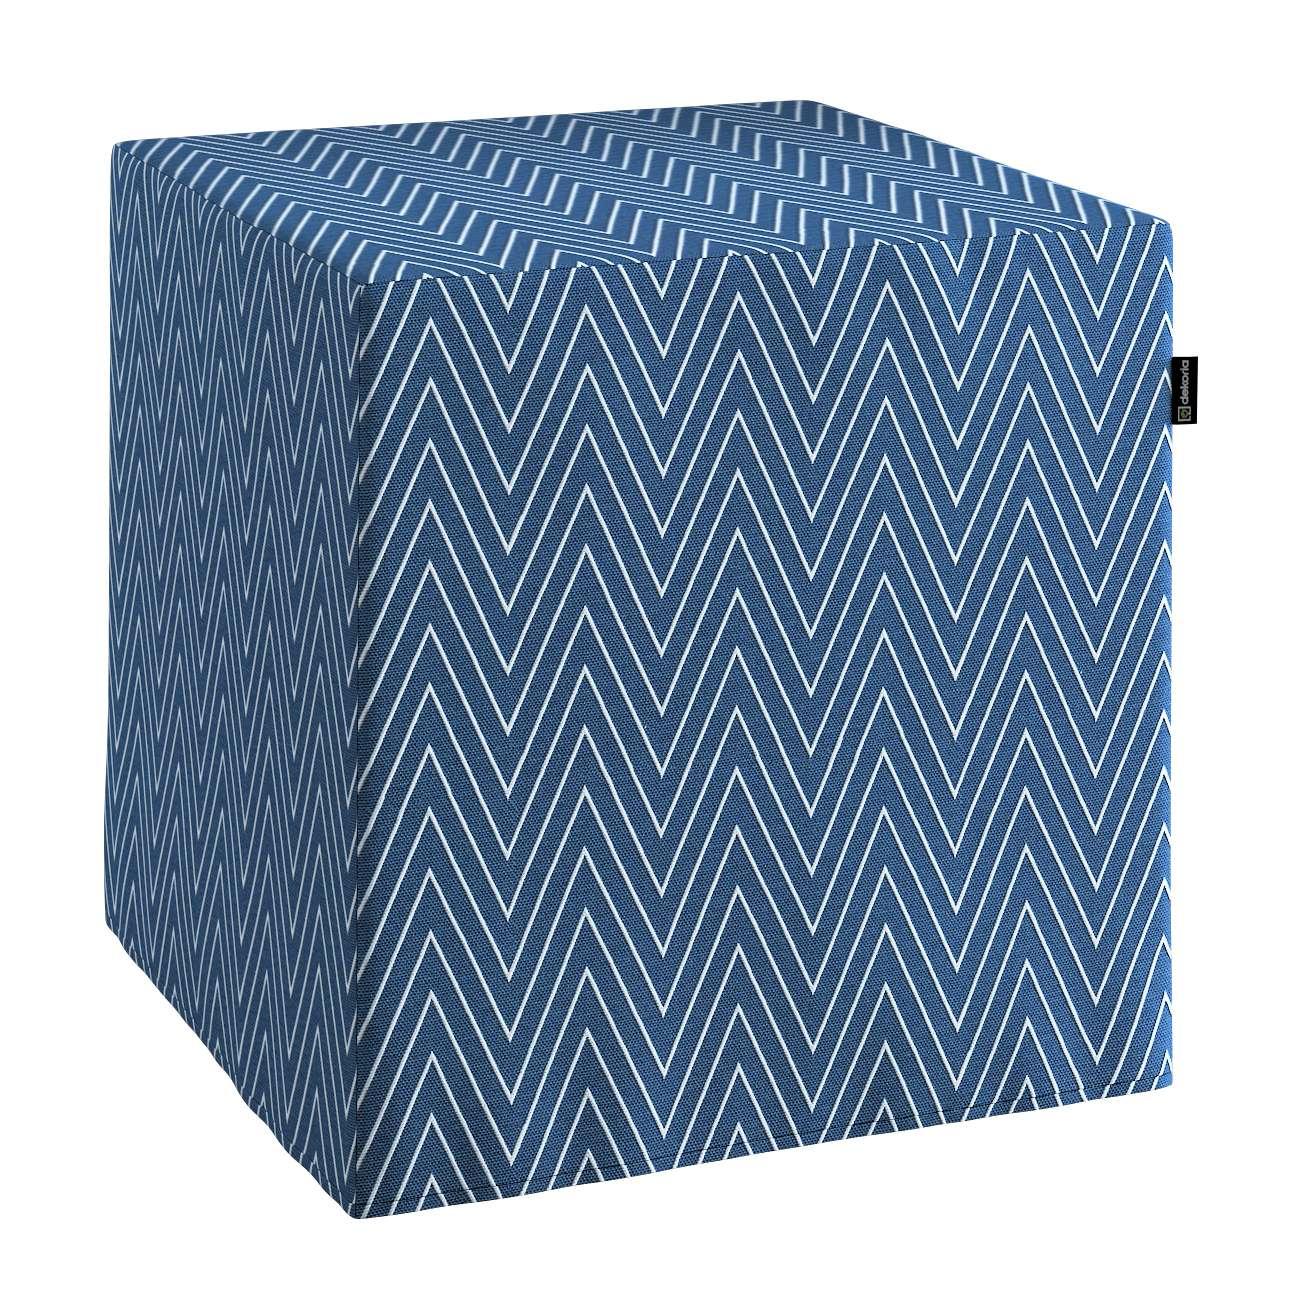 Sedák Cube - kostka pevná 40x40x40 v kolekci Brooklyn, látka: 137-88